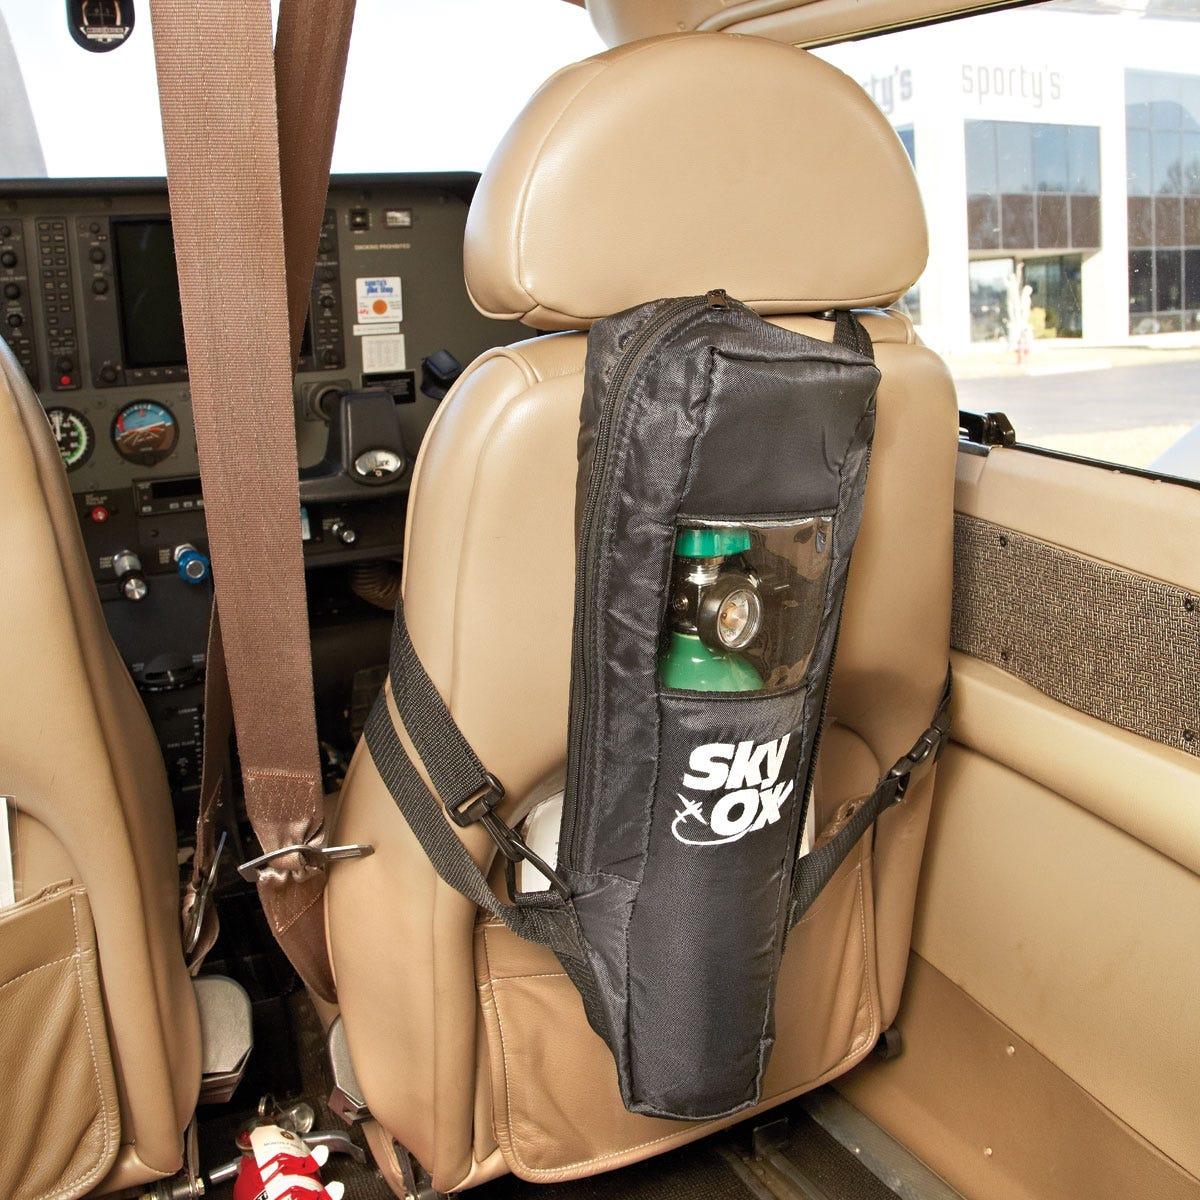 Oxygen tank on seatback